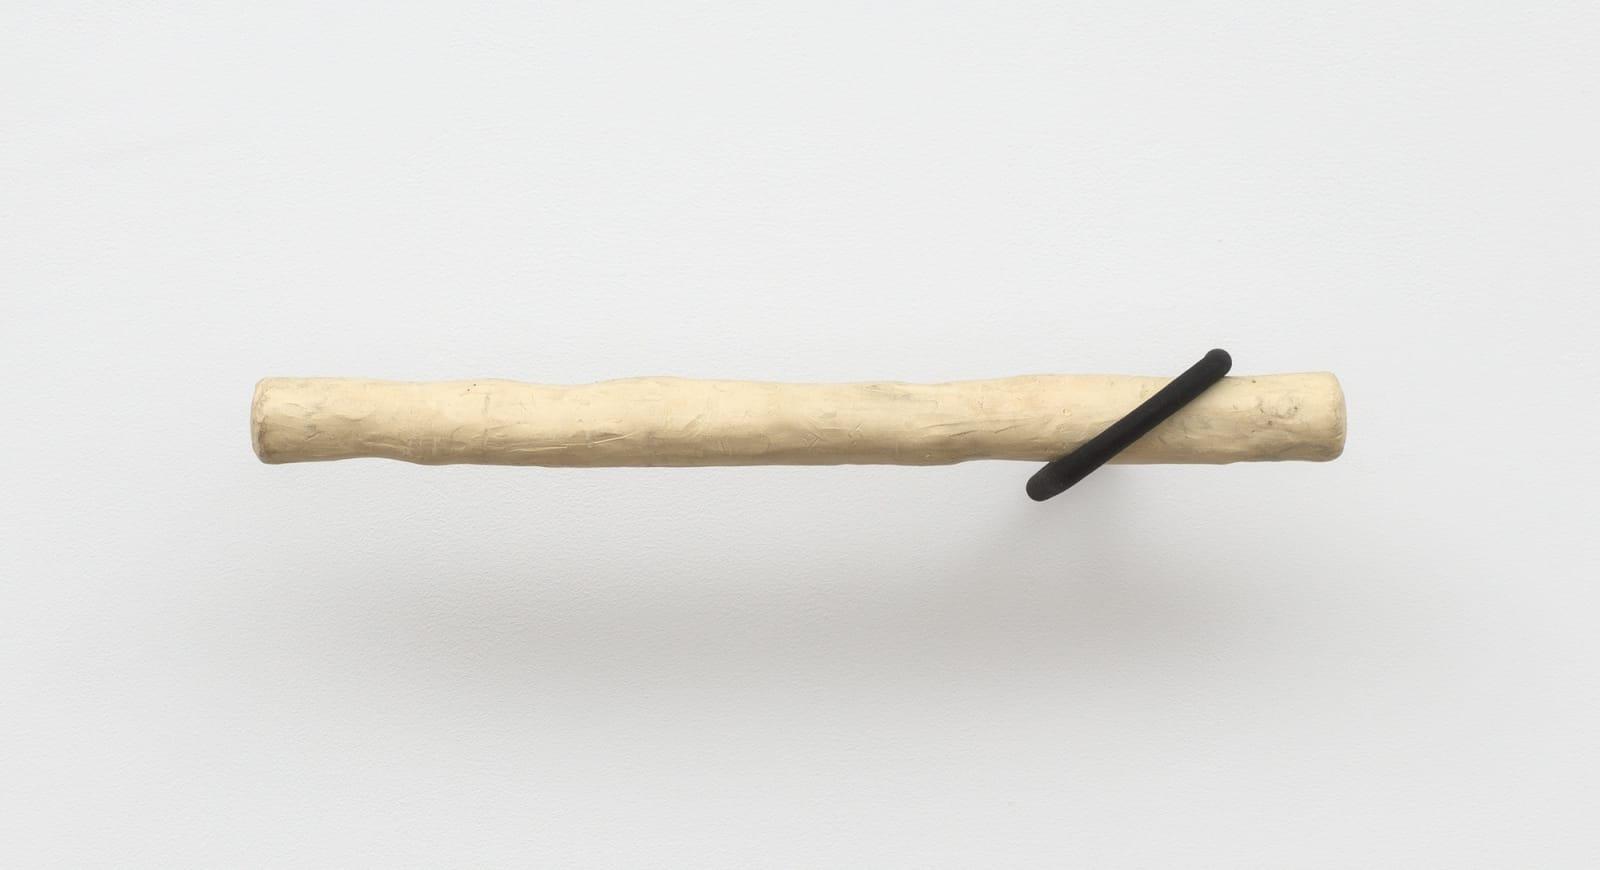 Gabriela Salazar (b. 1981) Hook Crook #12 (Gave Good Conspiracy), 2017 Wood, paper pulp, plasticine, found hook (steel and rubber) 19 3/4 x 3 1/2 x 7 in (50.2 x 8.9 x 17.8 cm) (GS7835)